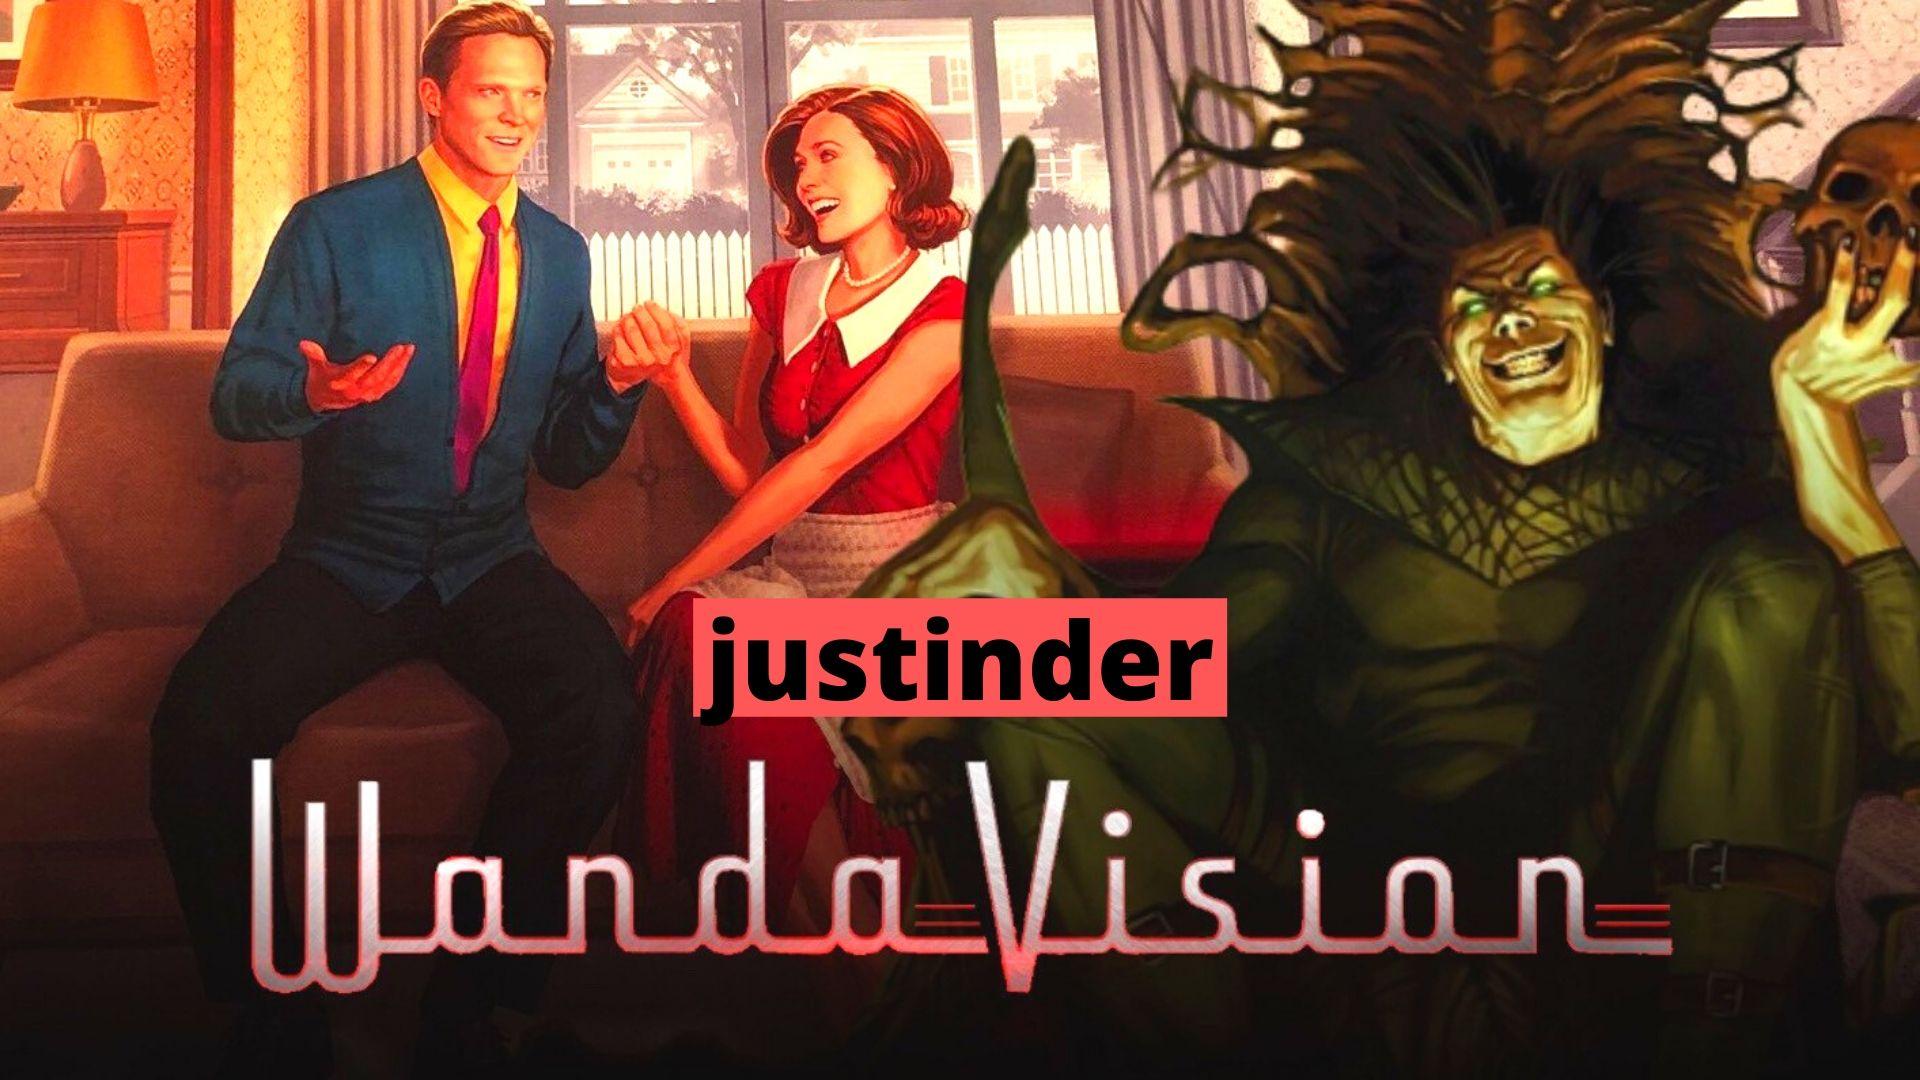 Wandervision justinder, WANDAVISION Tv Series